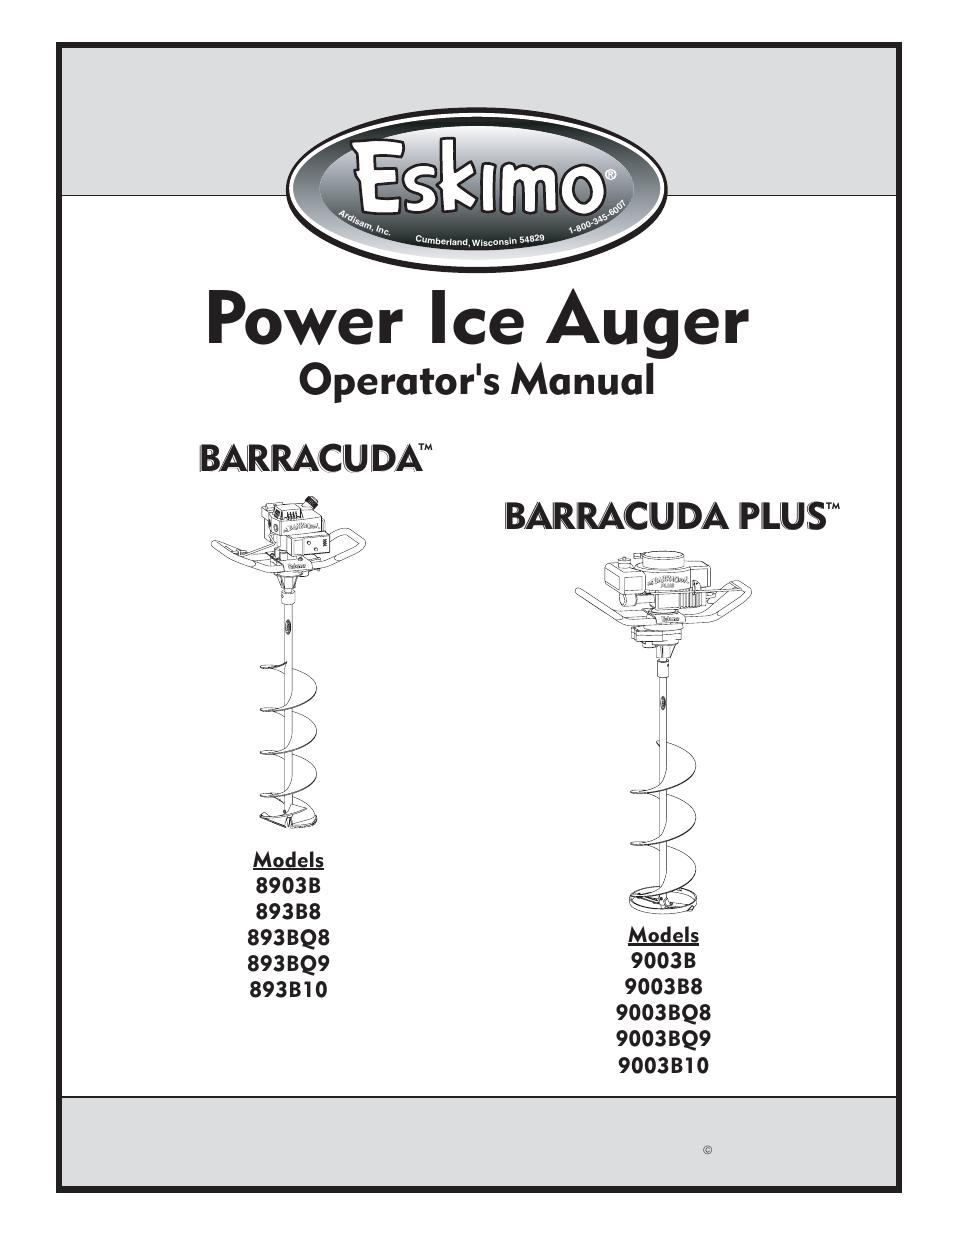 Eskimo 893BQ9 User Manual | 12 pages | Also for: 893BQ8, 893B8, 893B10,  8903B